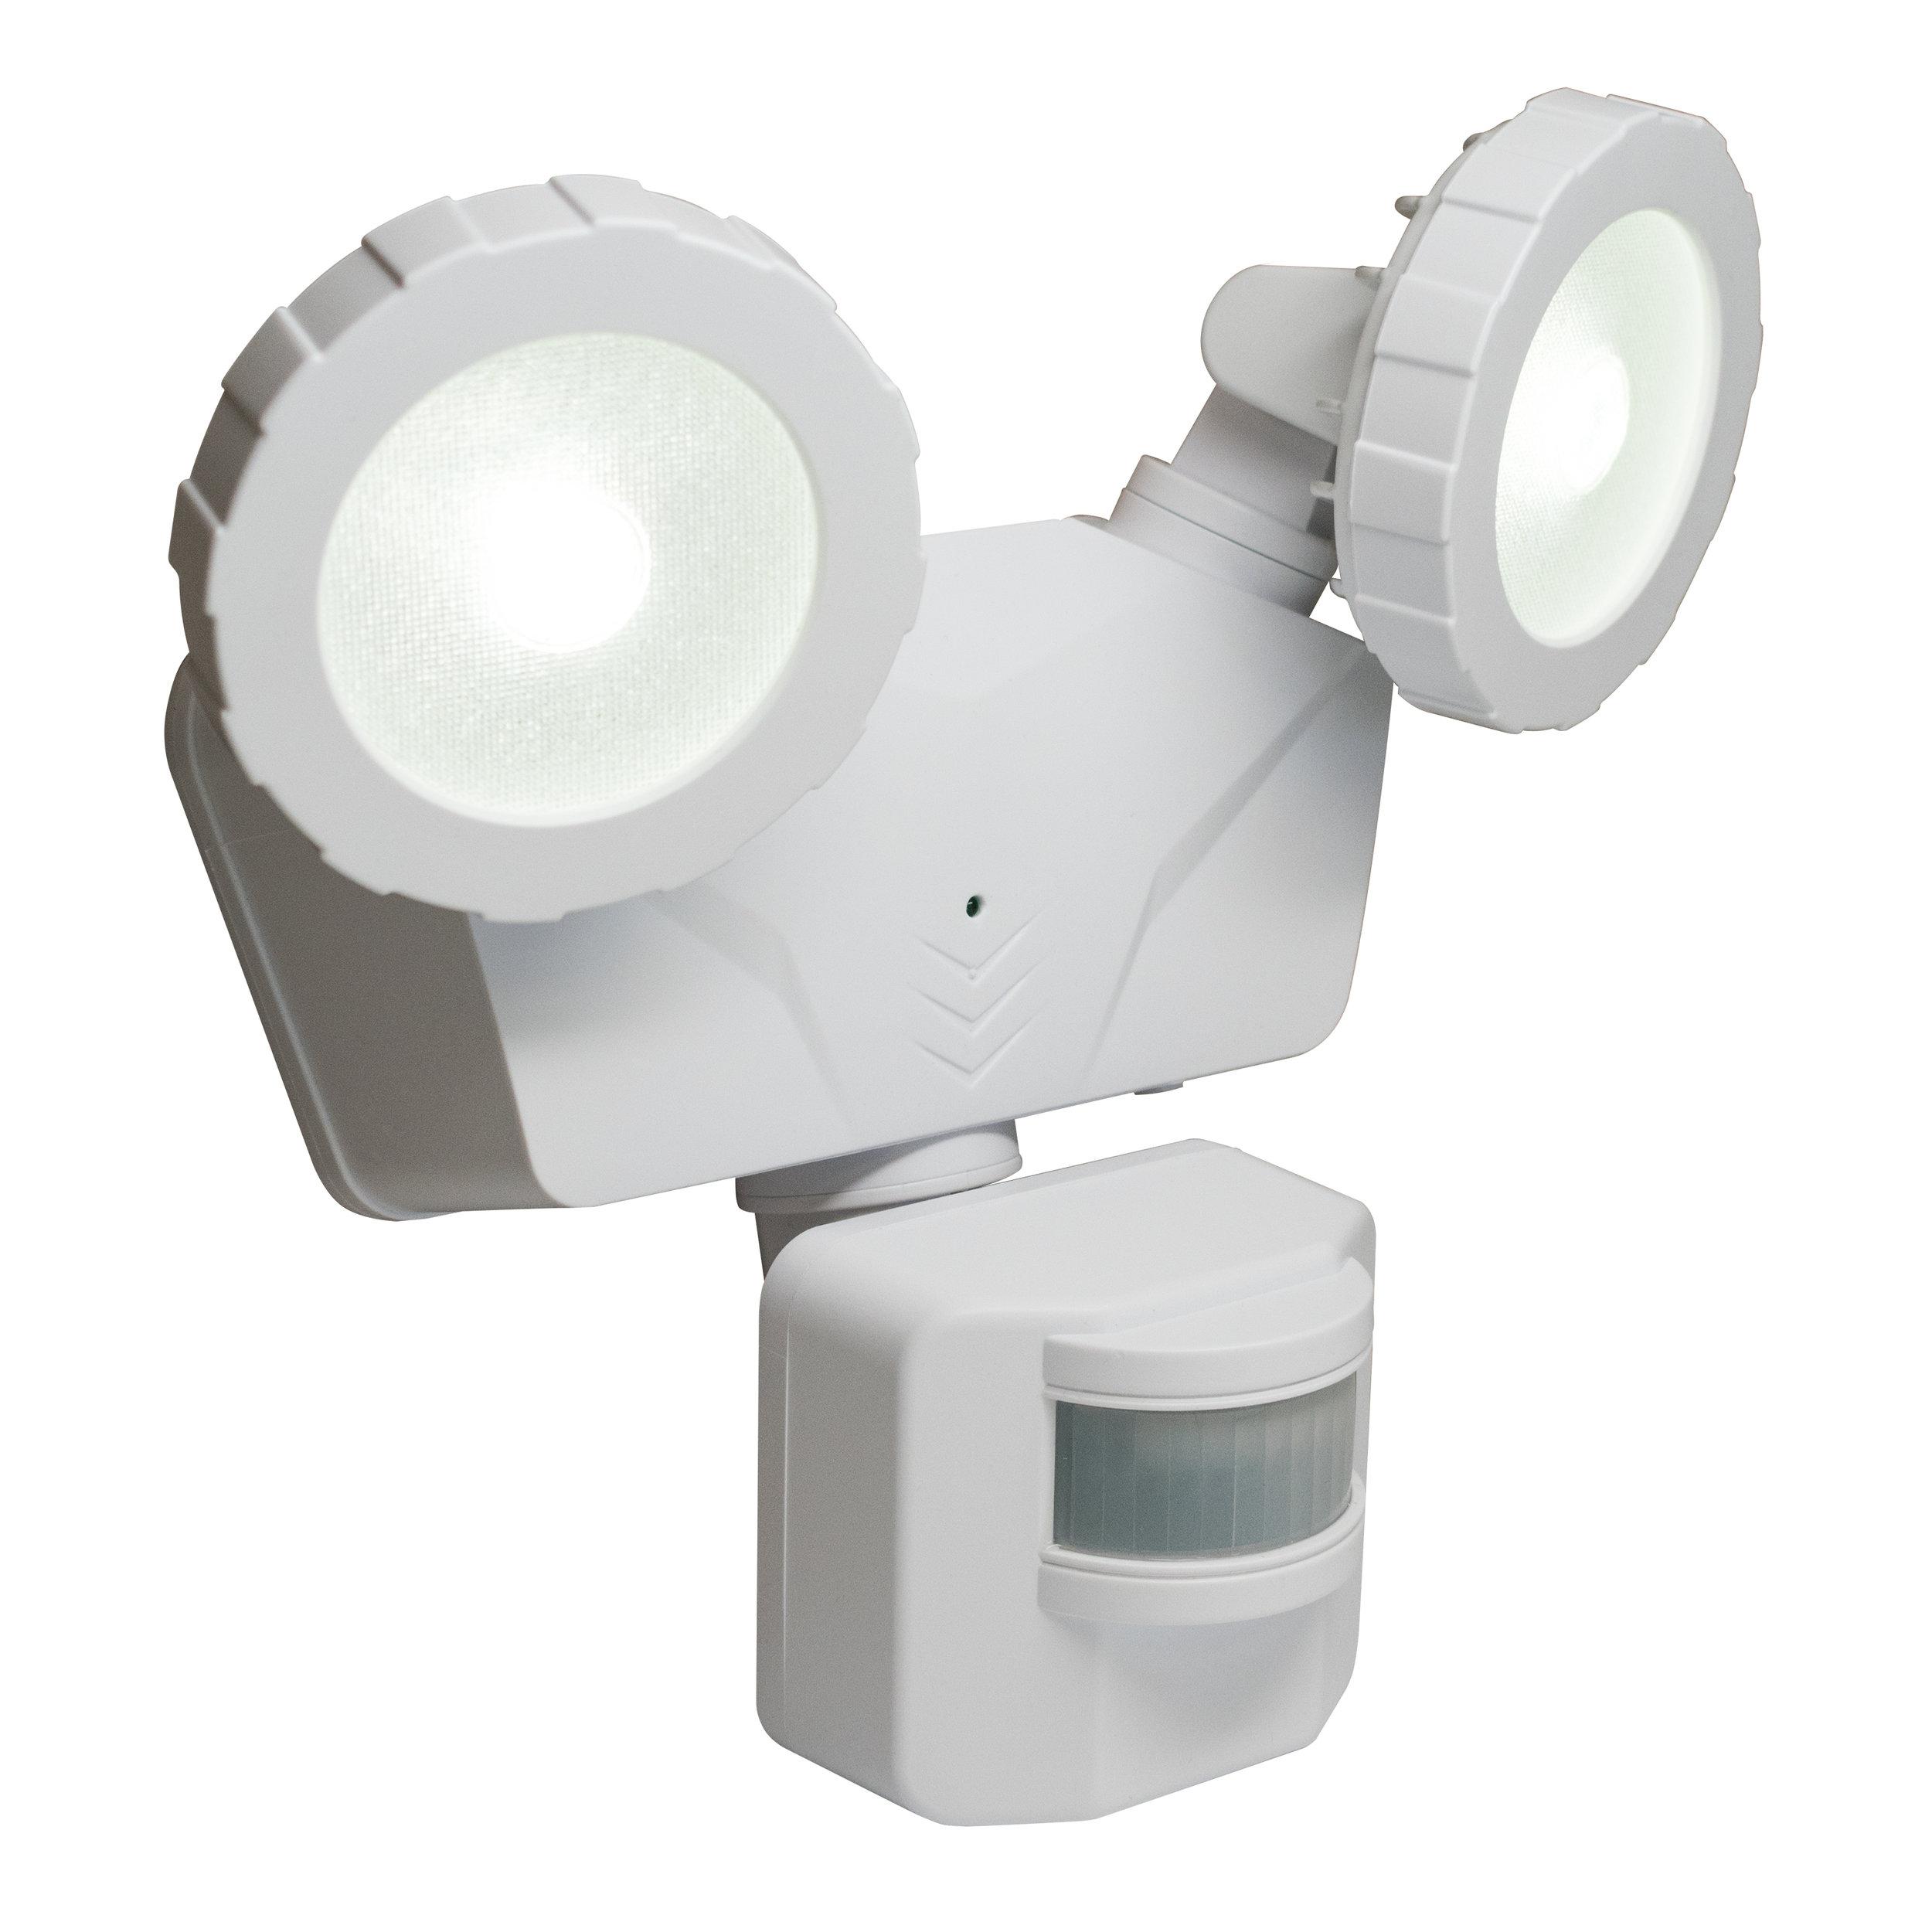 Novolink NL-DSW1 Solar Security Light, Isometric